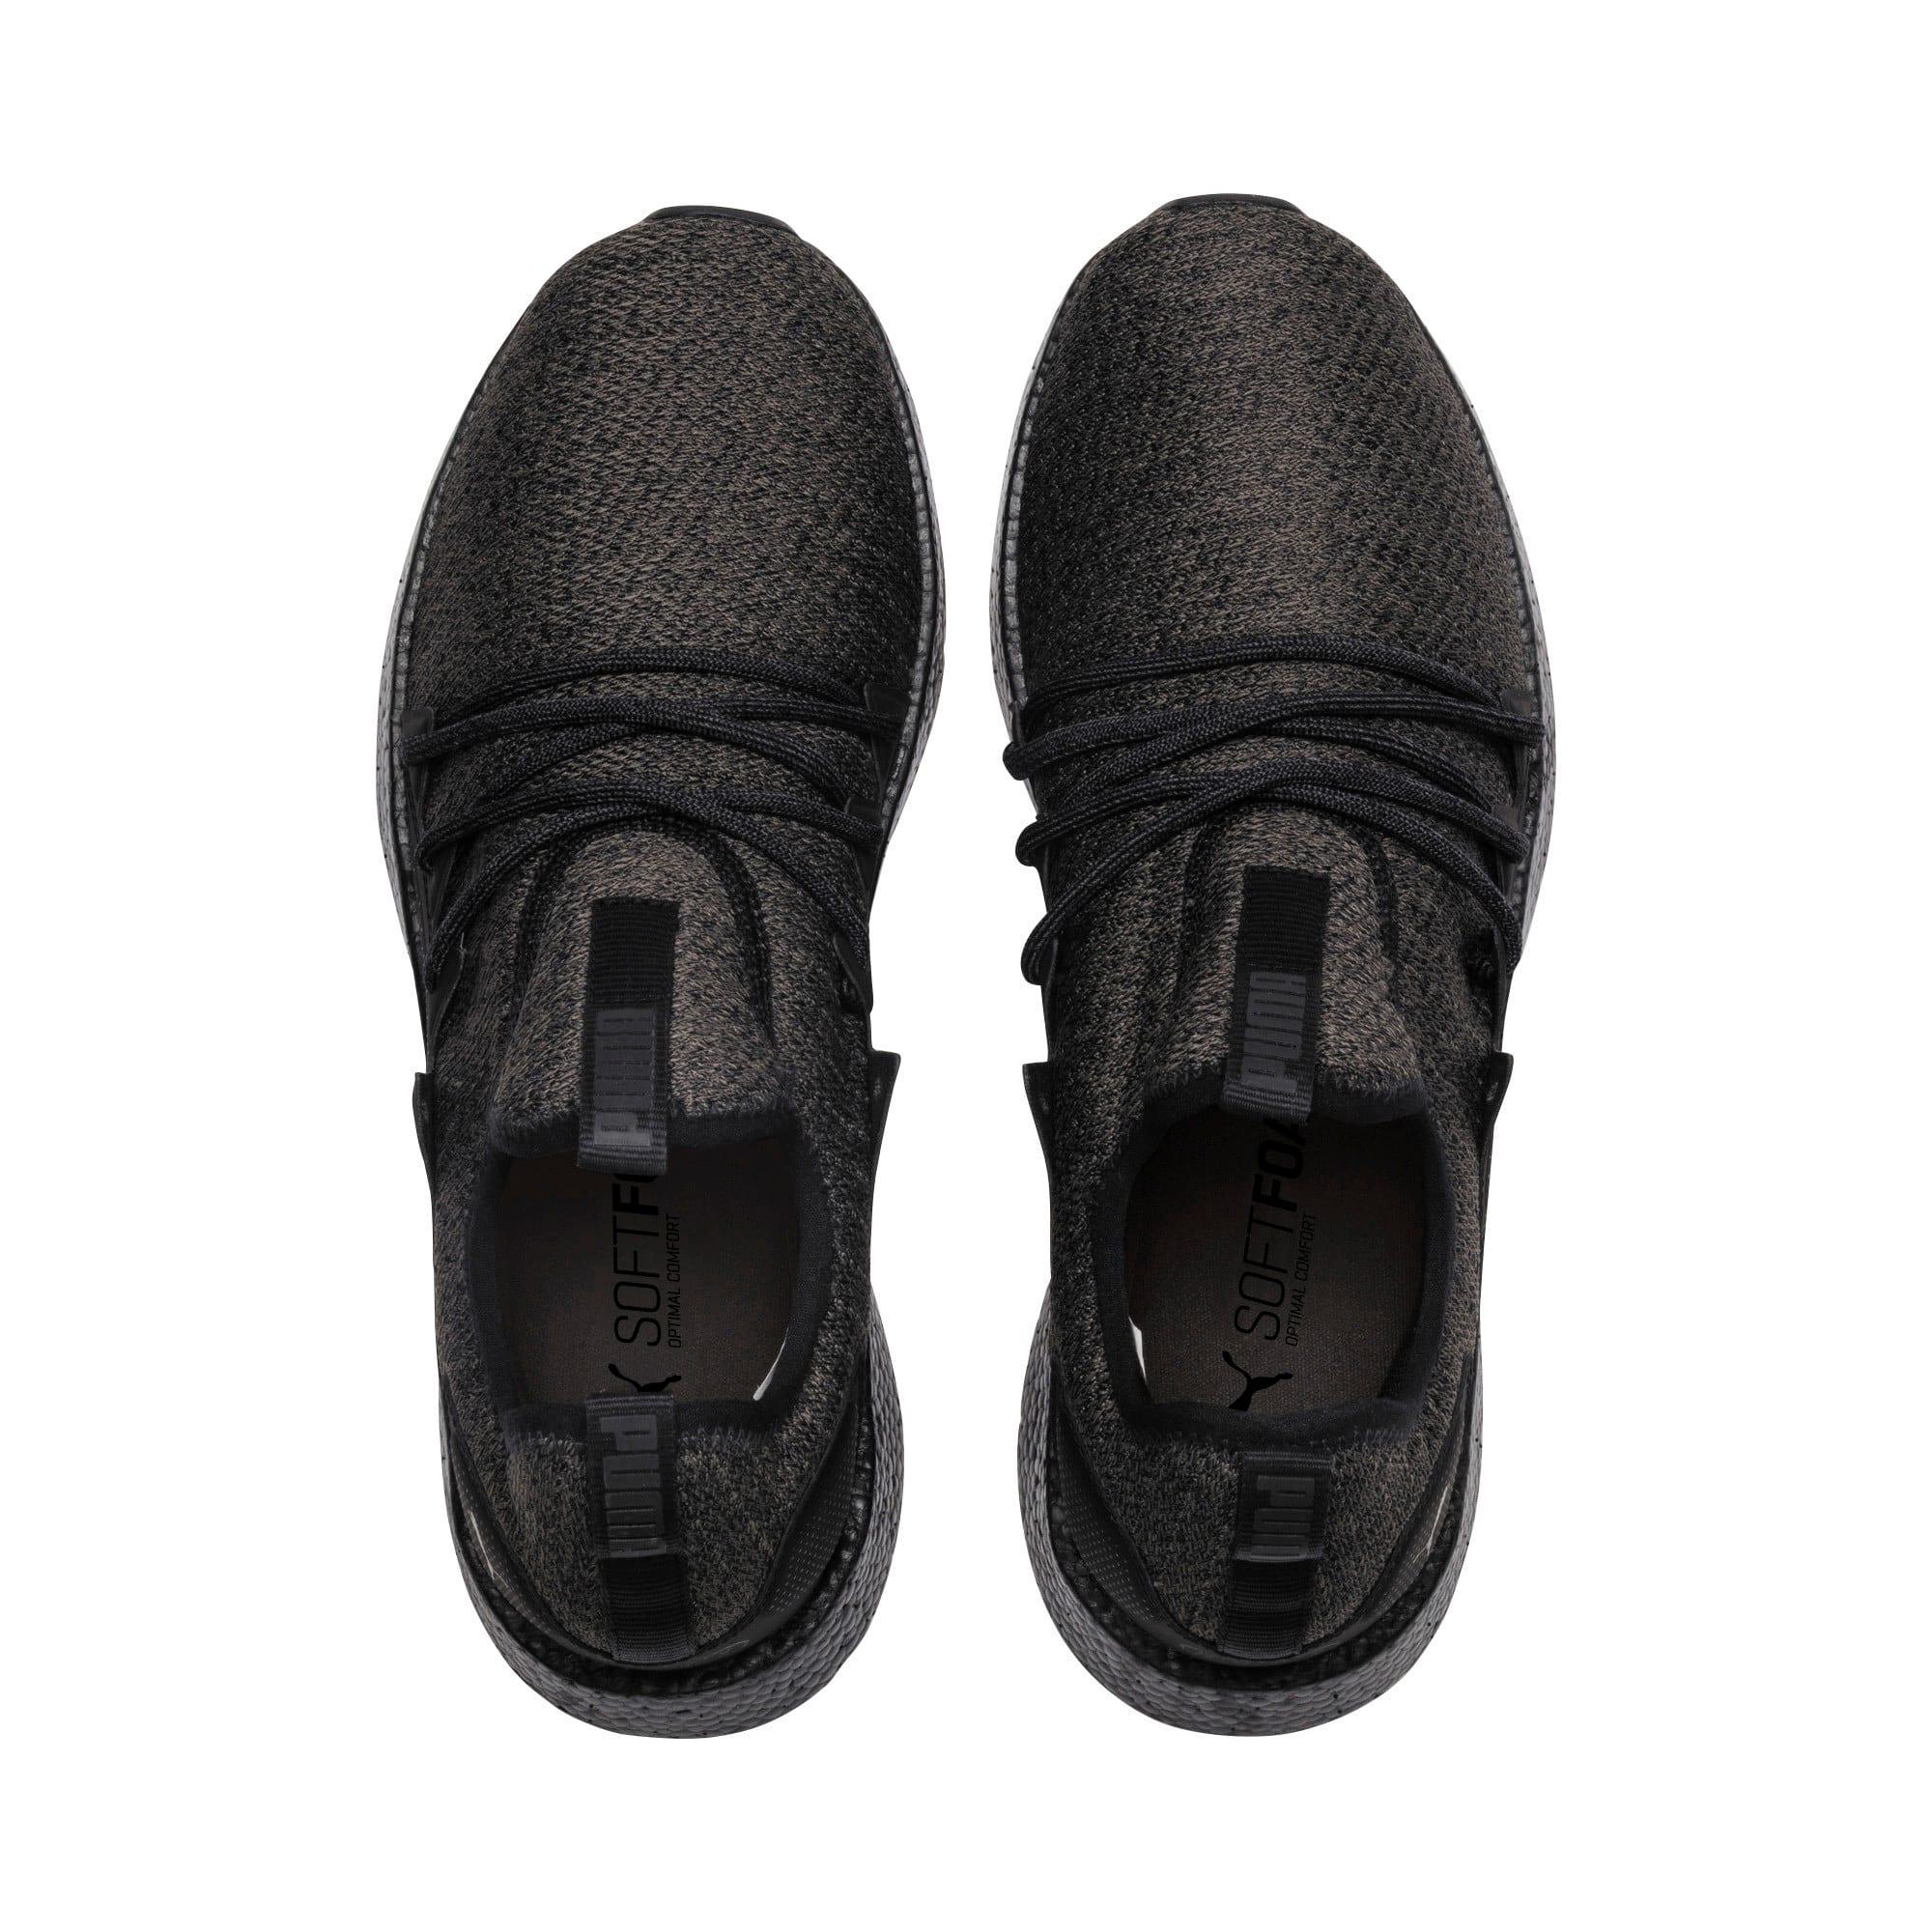 Thumbnail 6 of NRGY Neko Knit Men's Running Shoes, Puma Black-Puma Black, medium